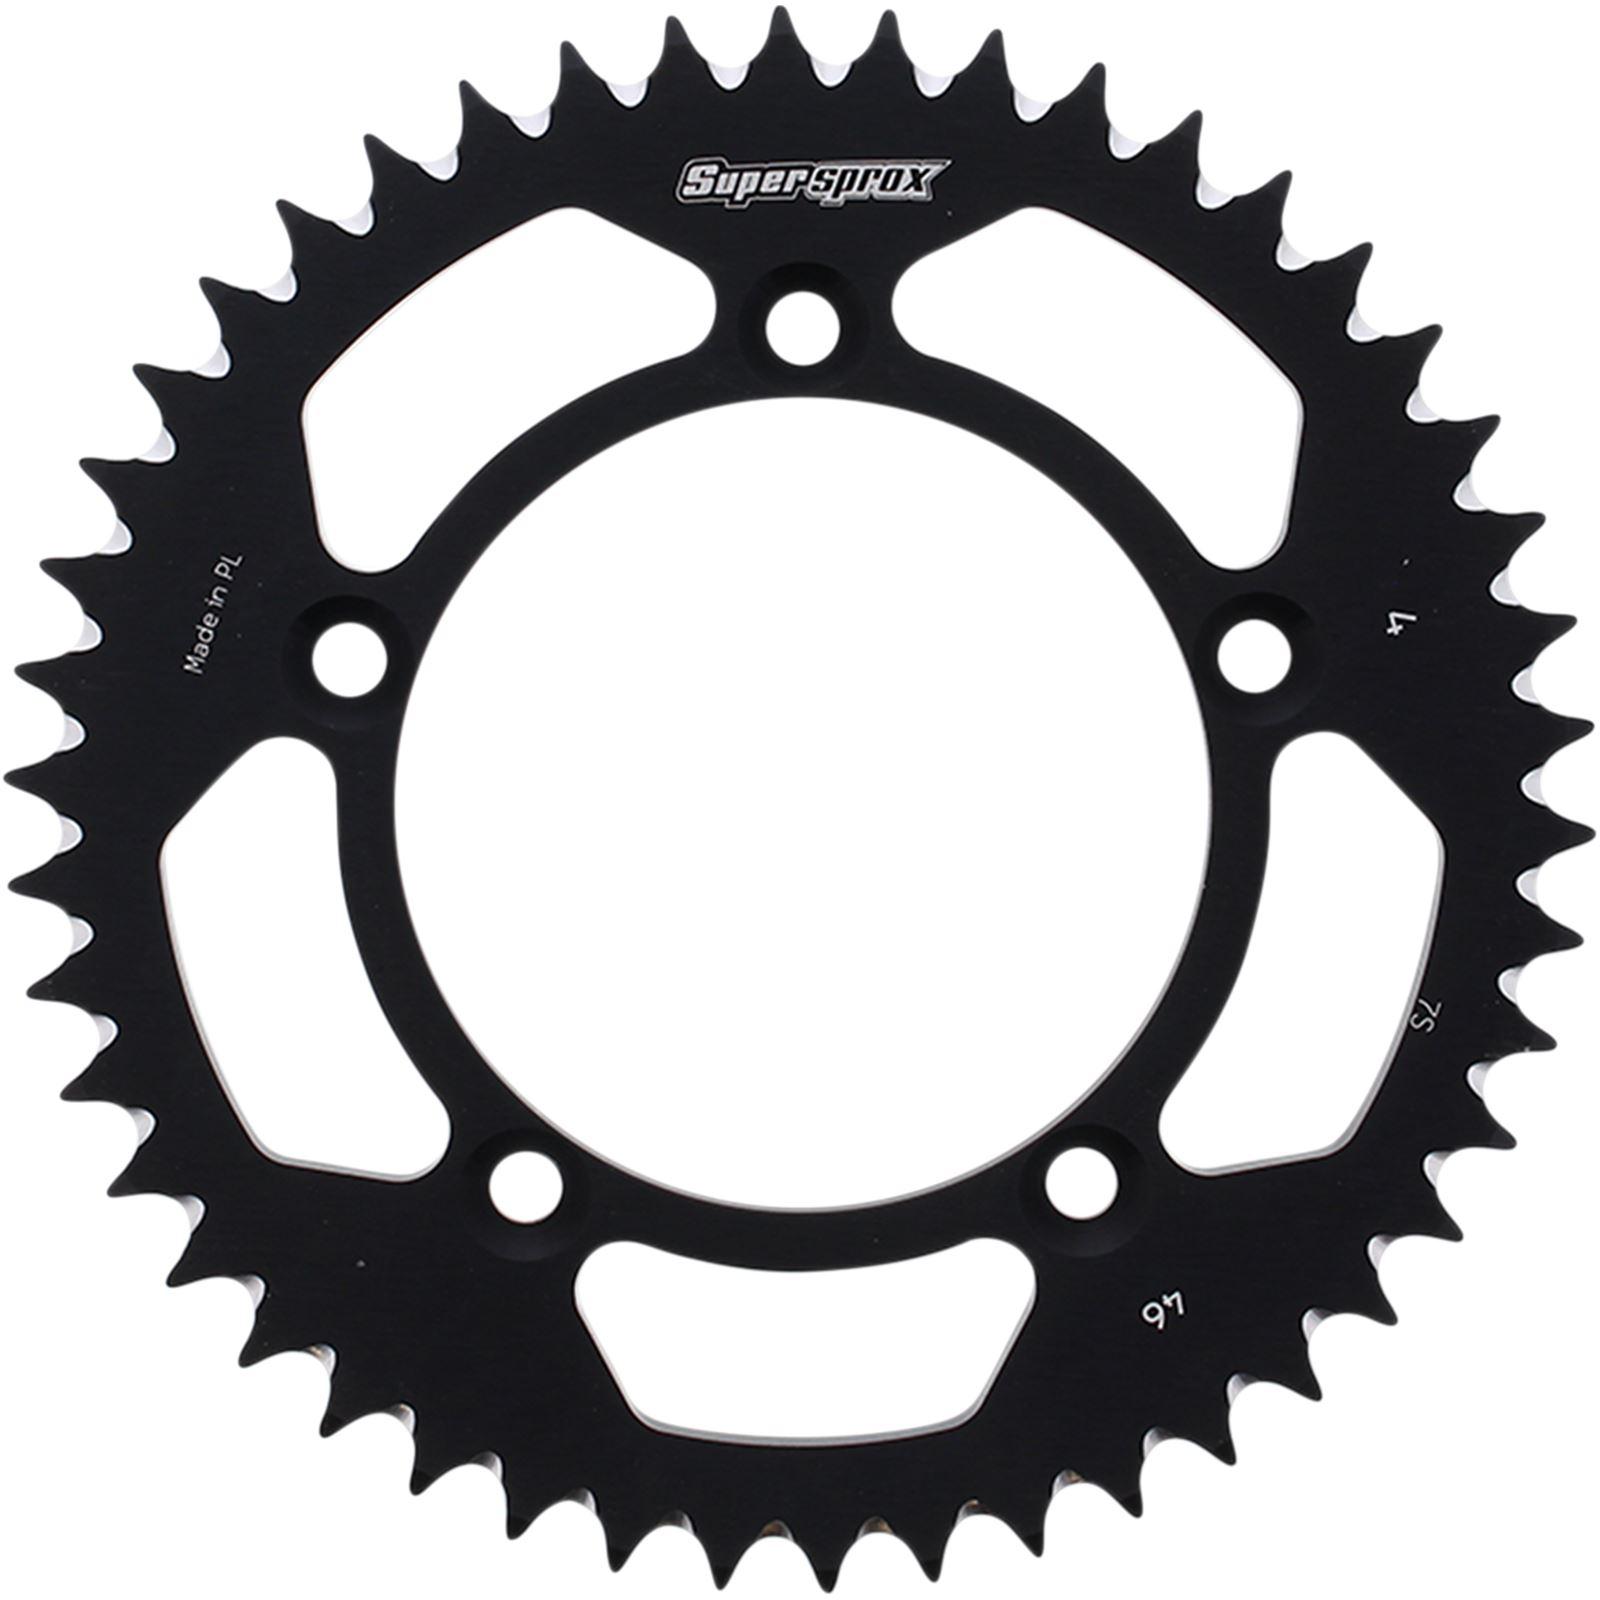 Supersprox Rear Sprocket - Black for Husqvarna/KTM - 46-Tooth